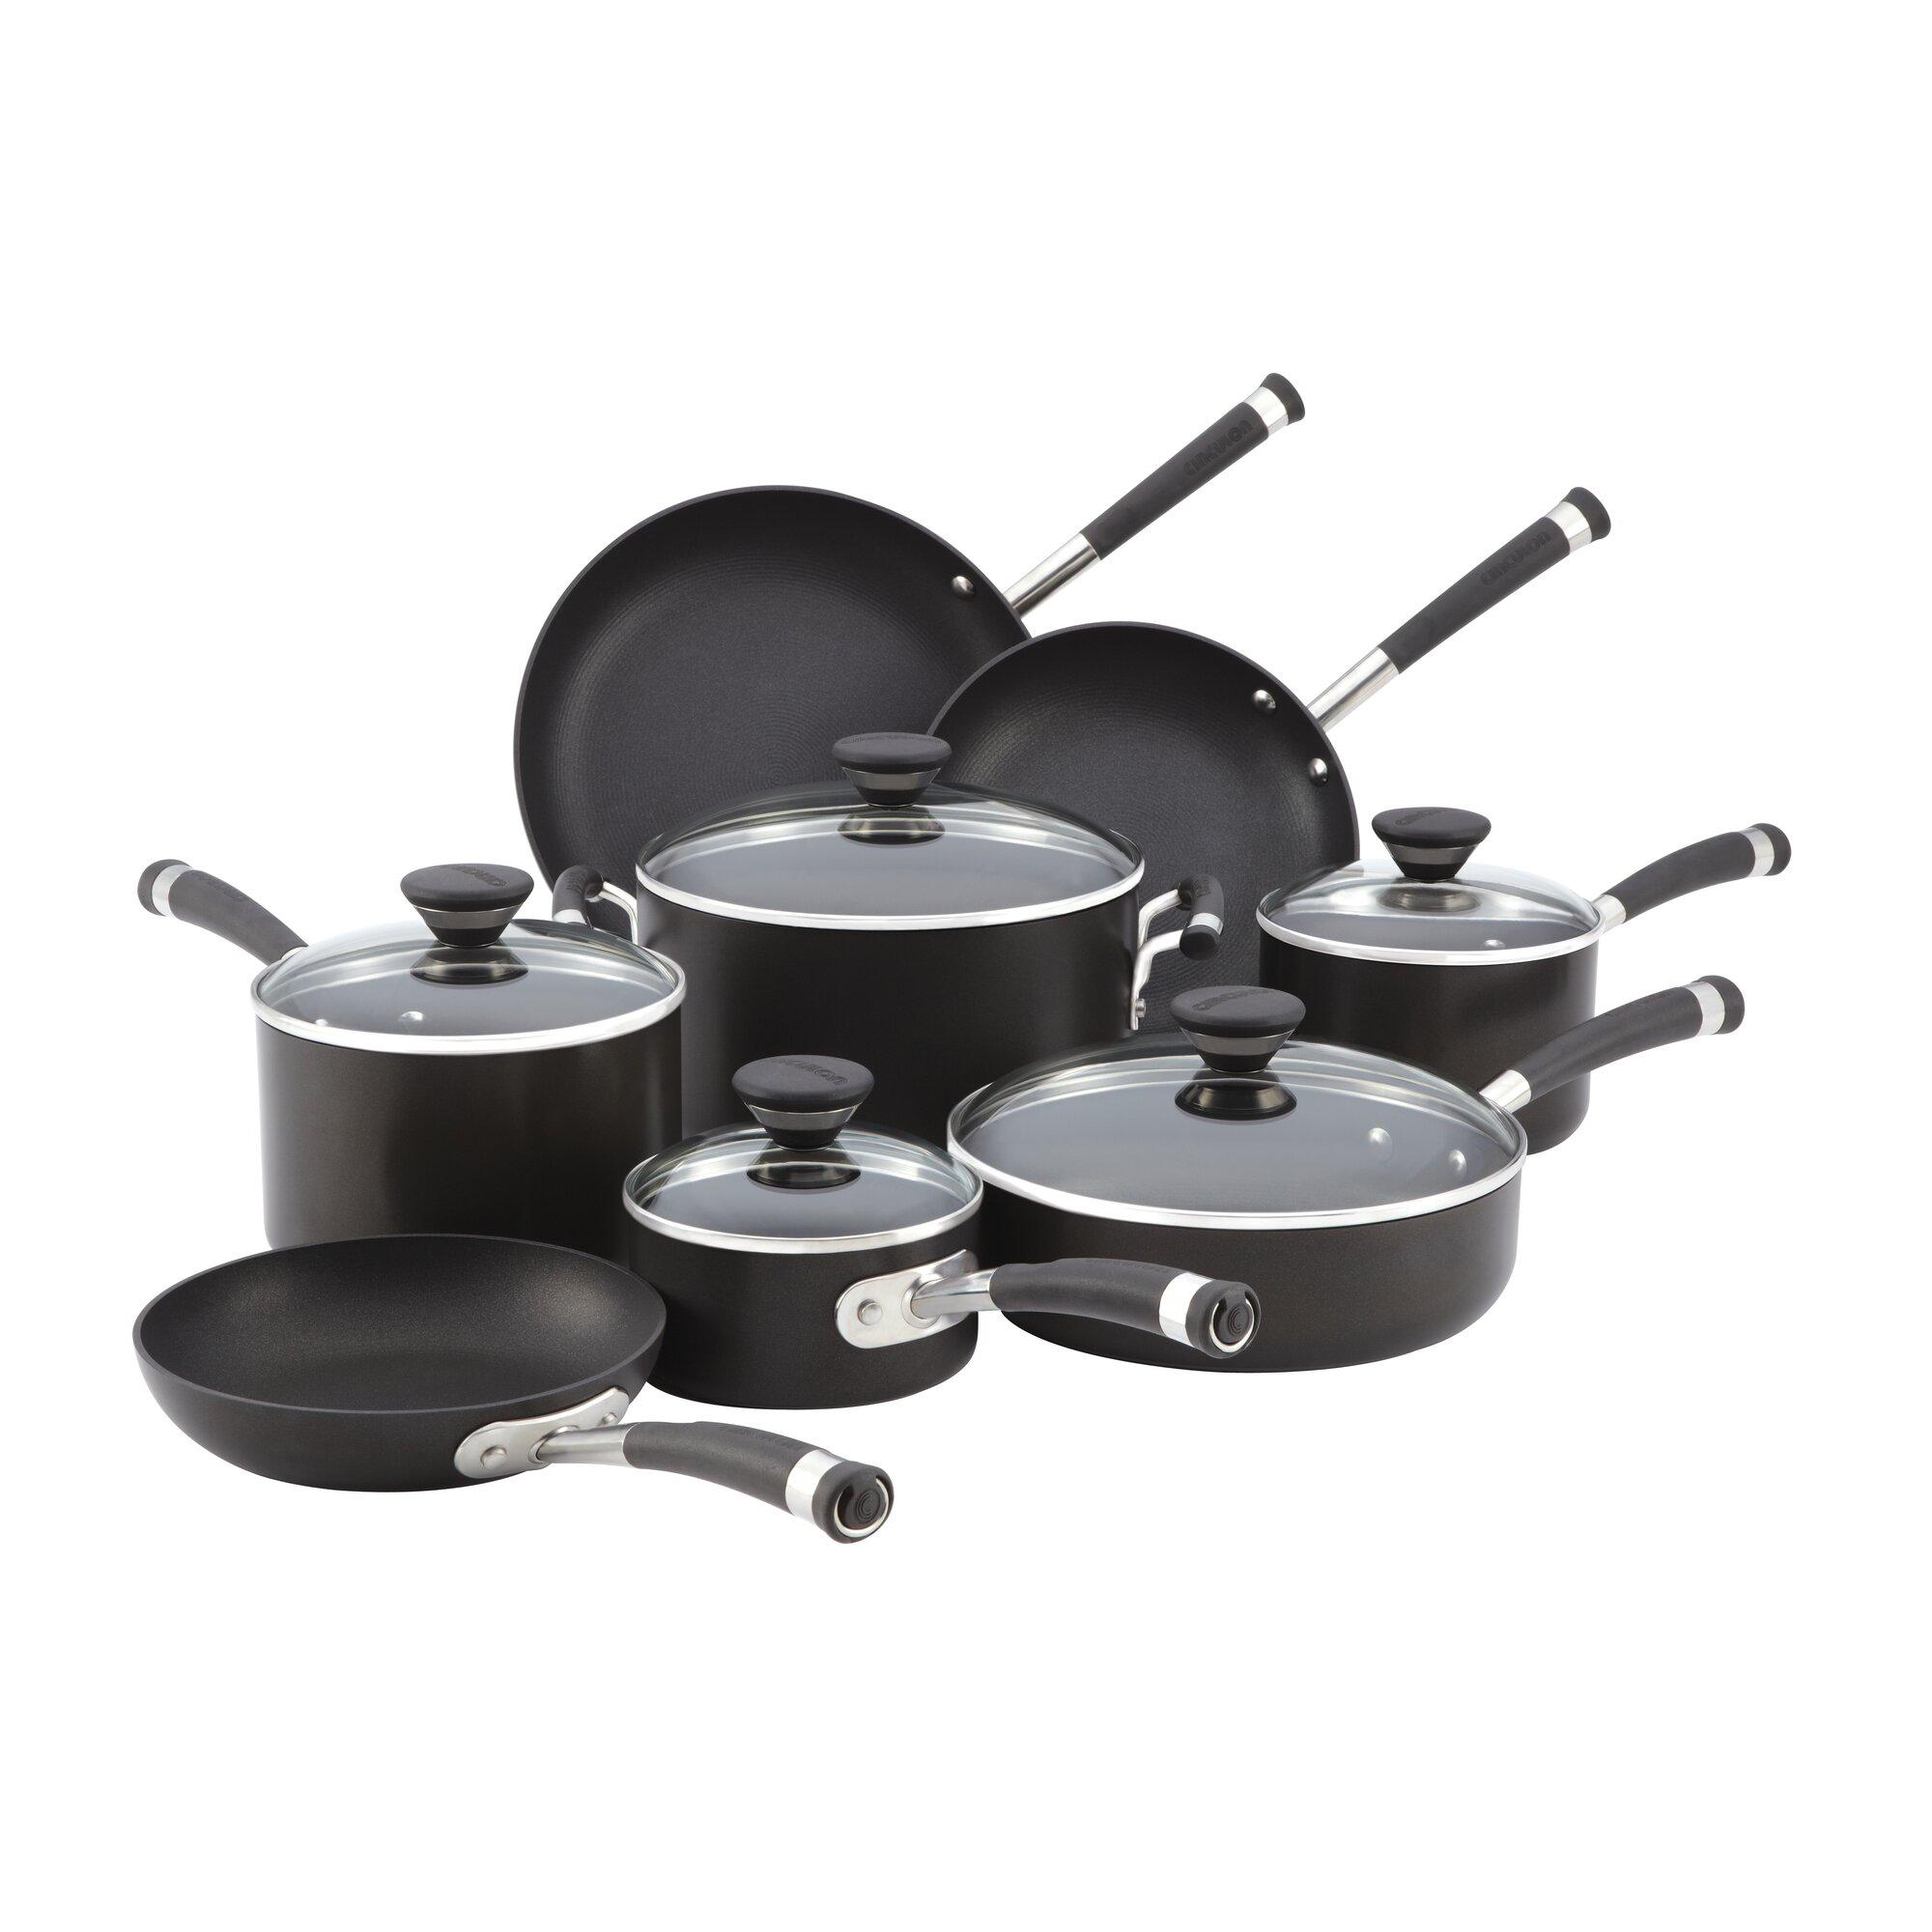 Circulon Acclaim Hard Anodized 13 Piece Cookware Set